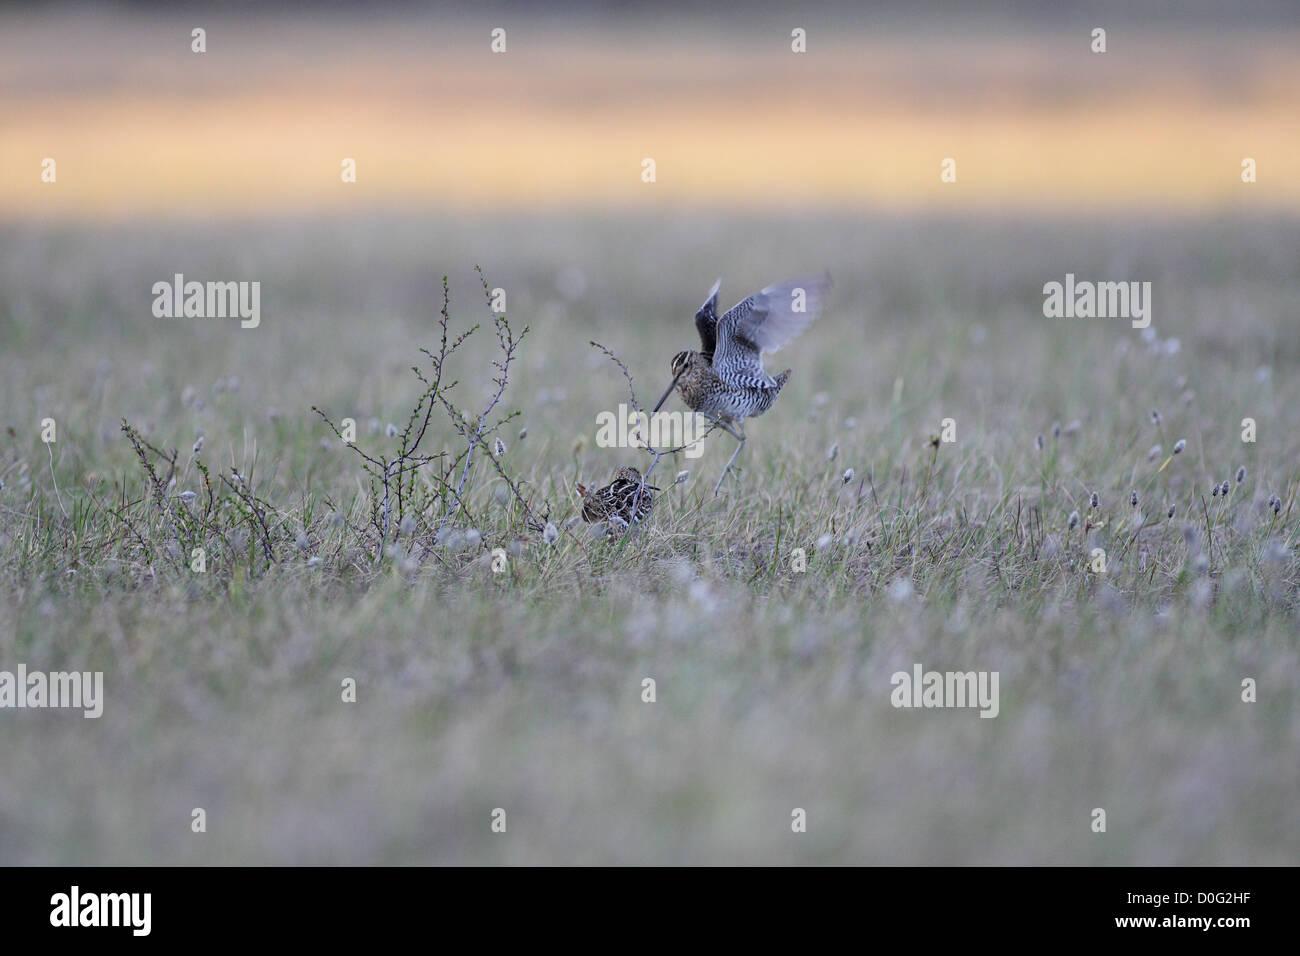 great snipes performing lekking behaviour - Stock Image